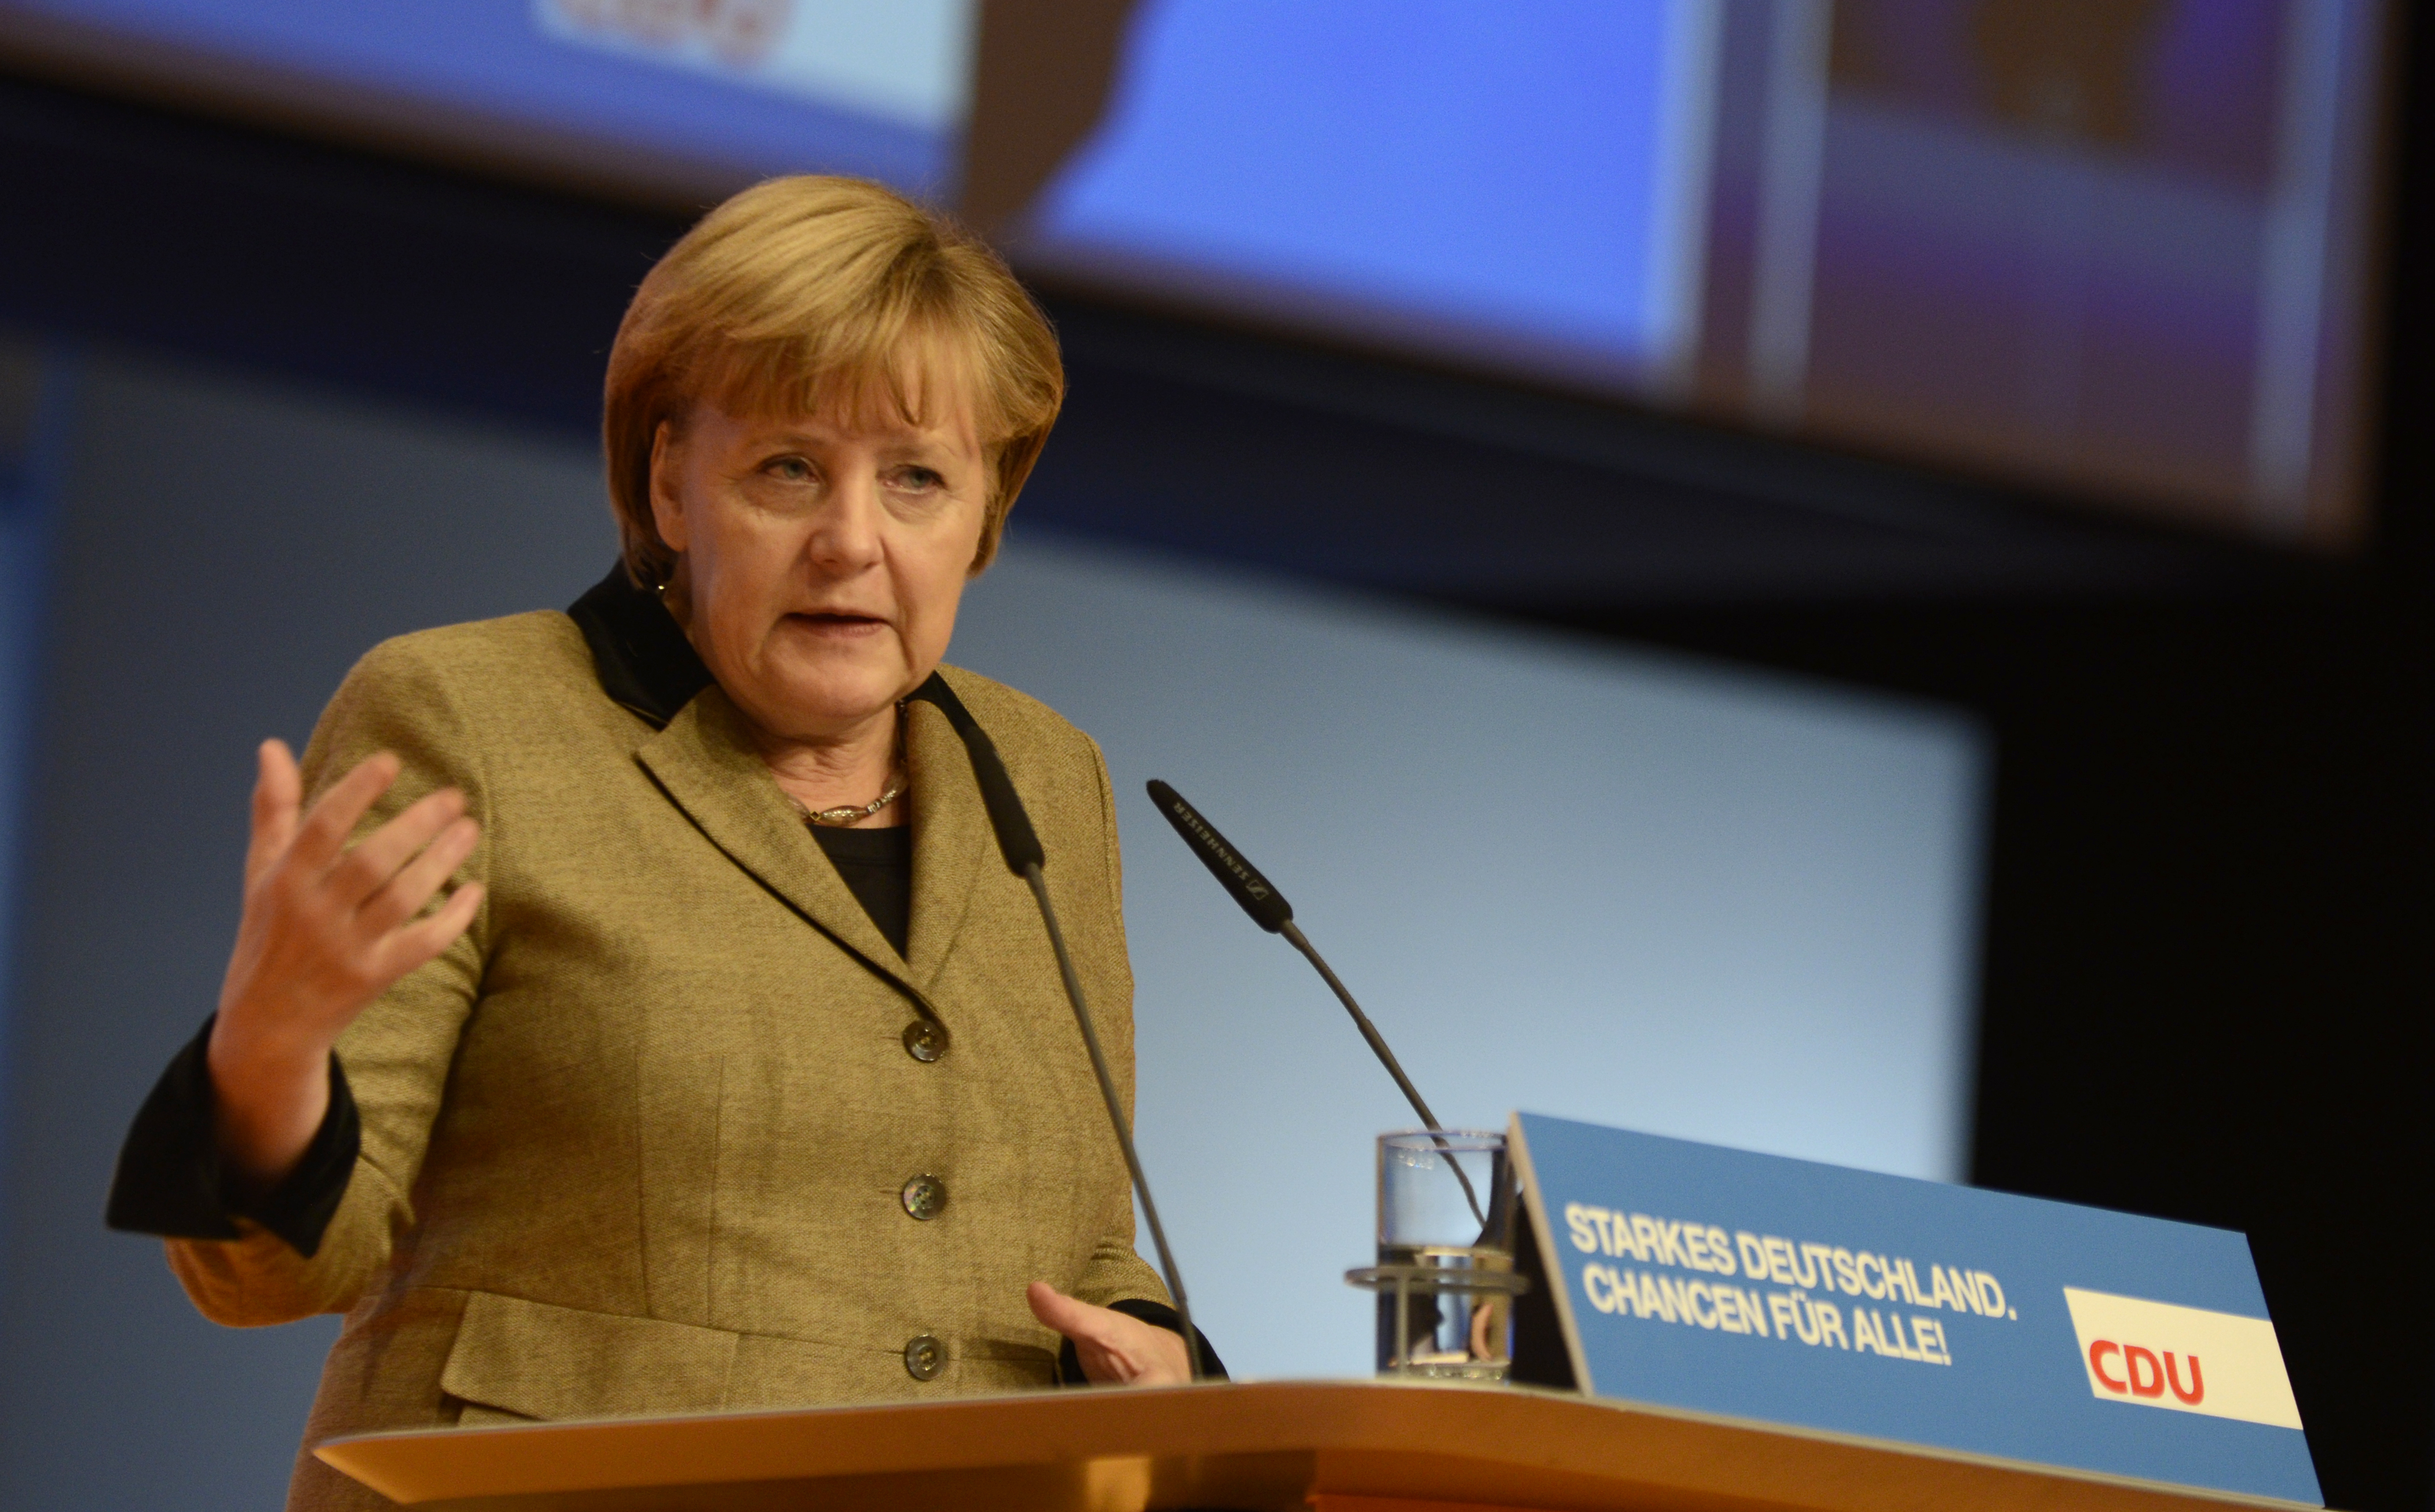 By CDU/CSU-Bundestagsfraktion (Own work) [CC-BY-SA-3.0 (http://creativecommons.org/licenses/by-sa/3.0)], via Wikimedia Commons